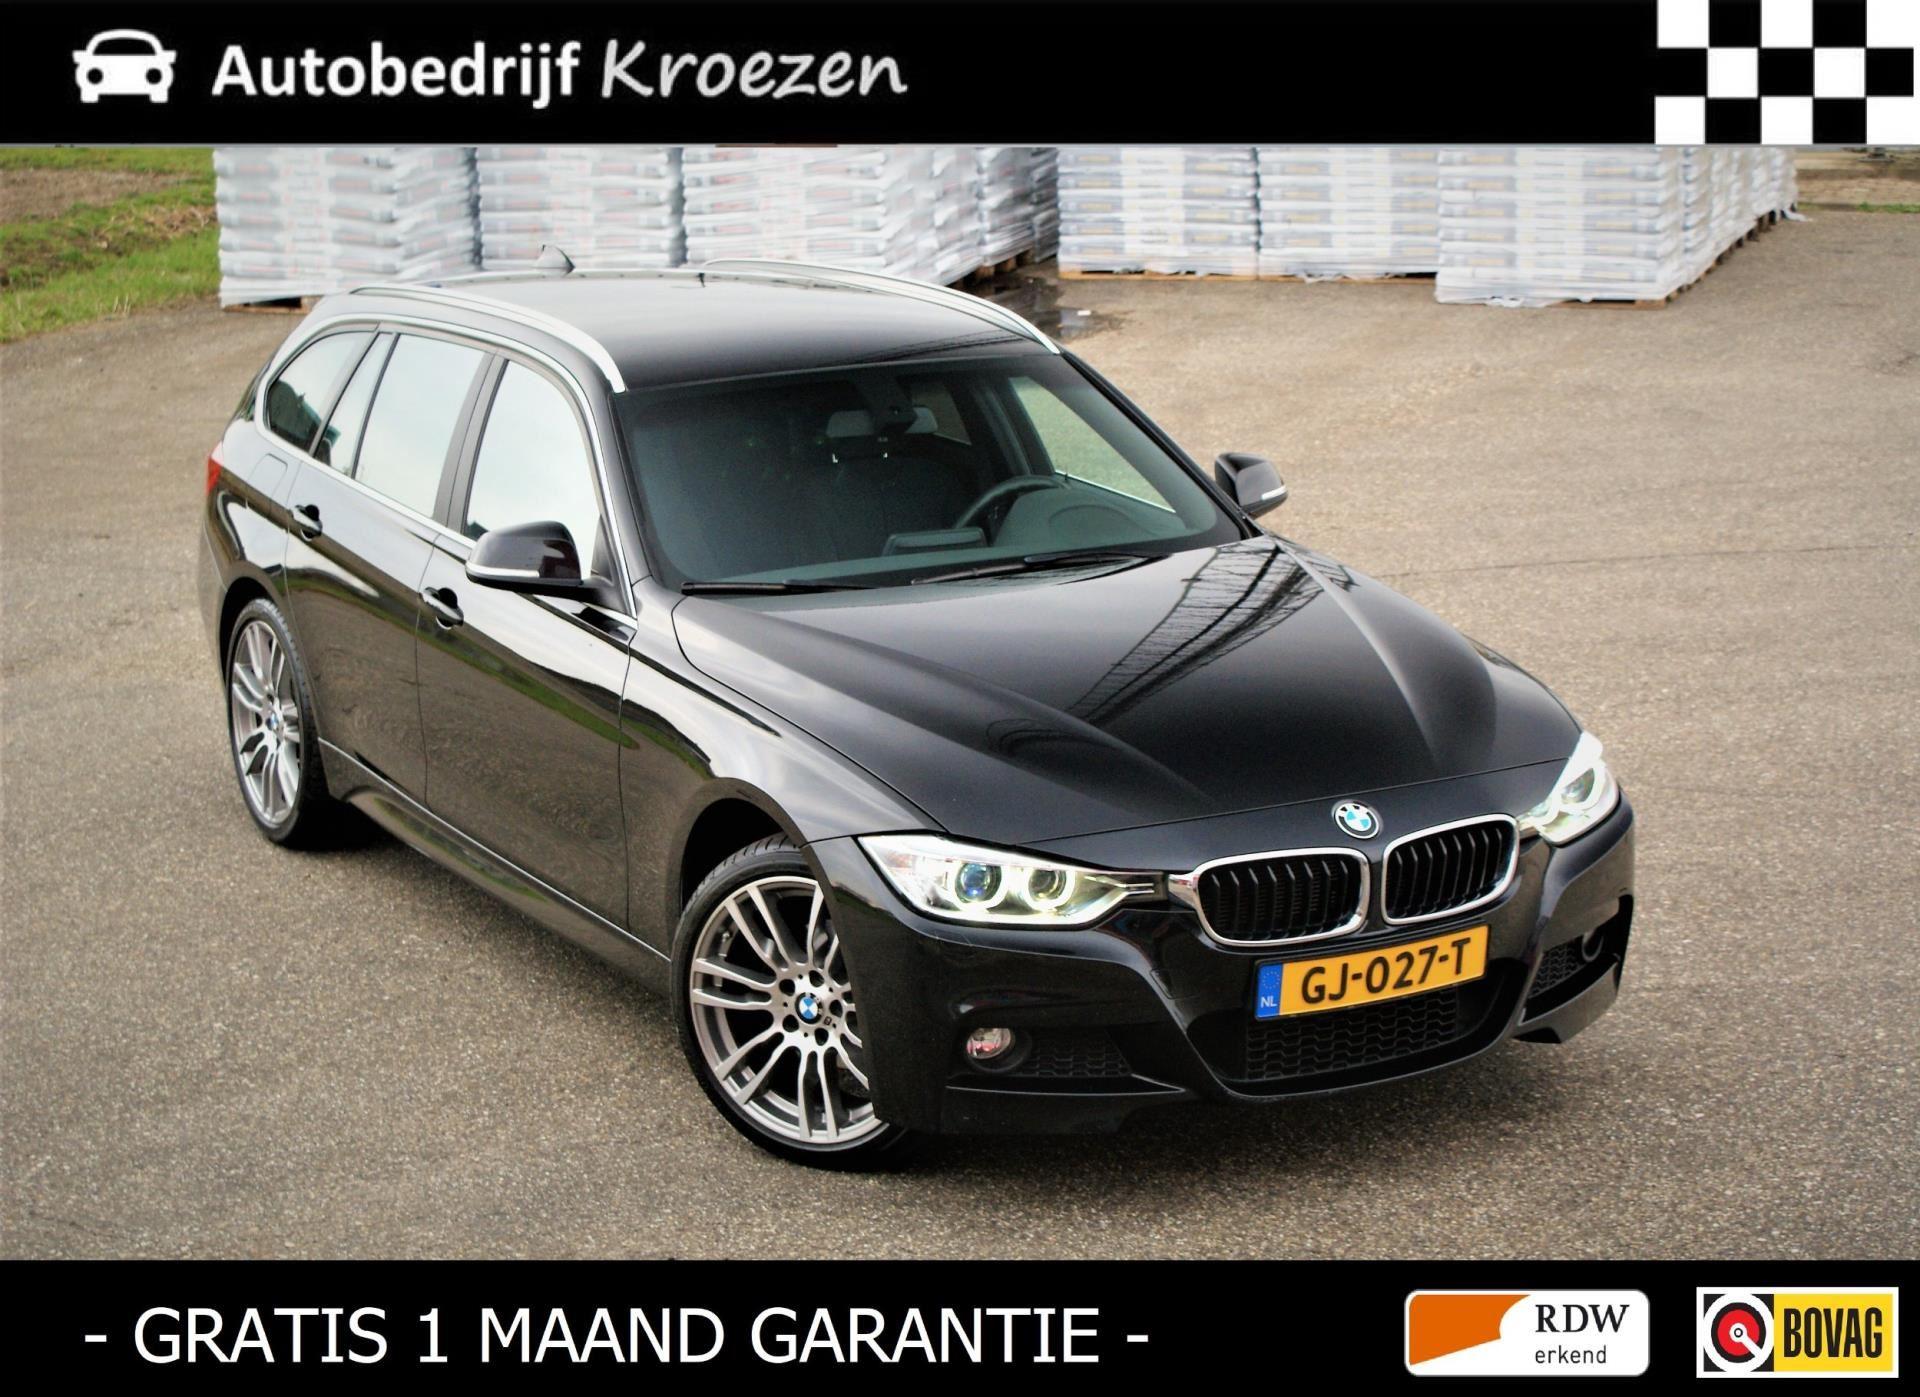 BMW 3-serie Touring occasion - Autobedrijf Kroezen